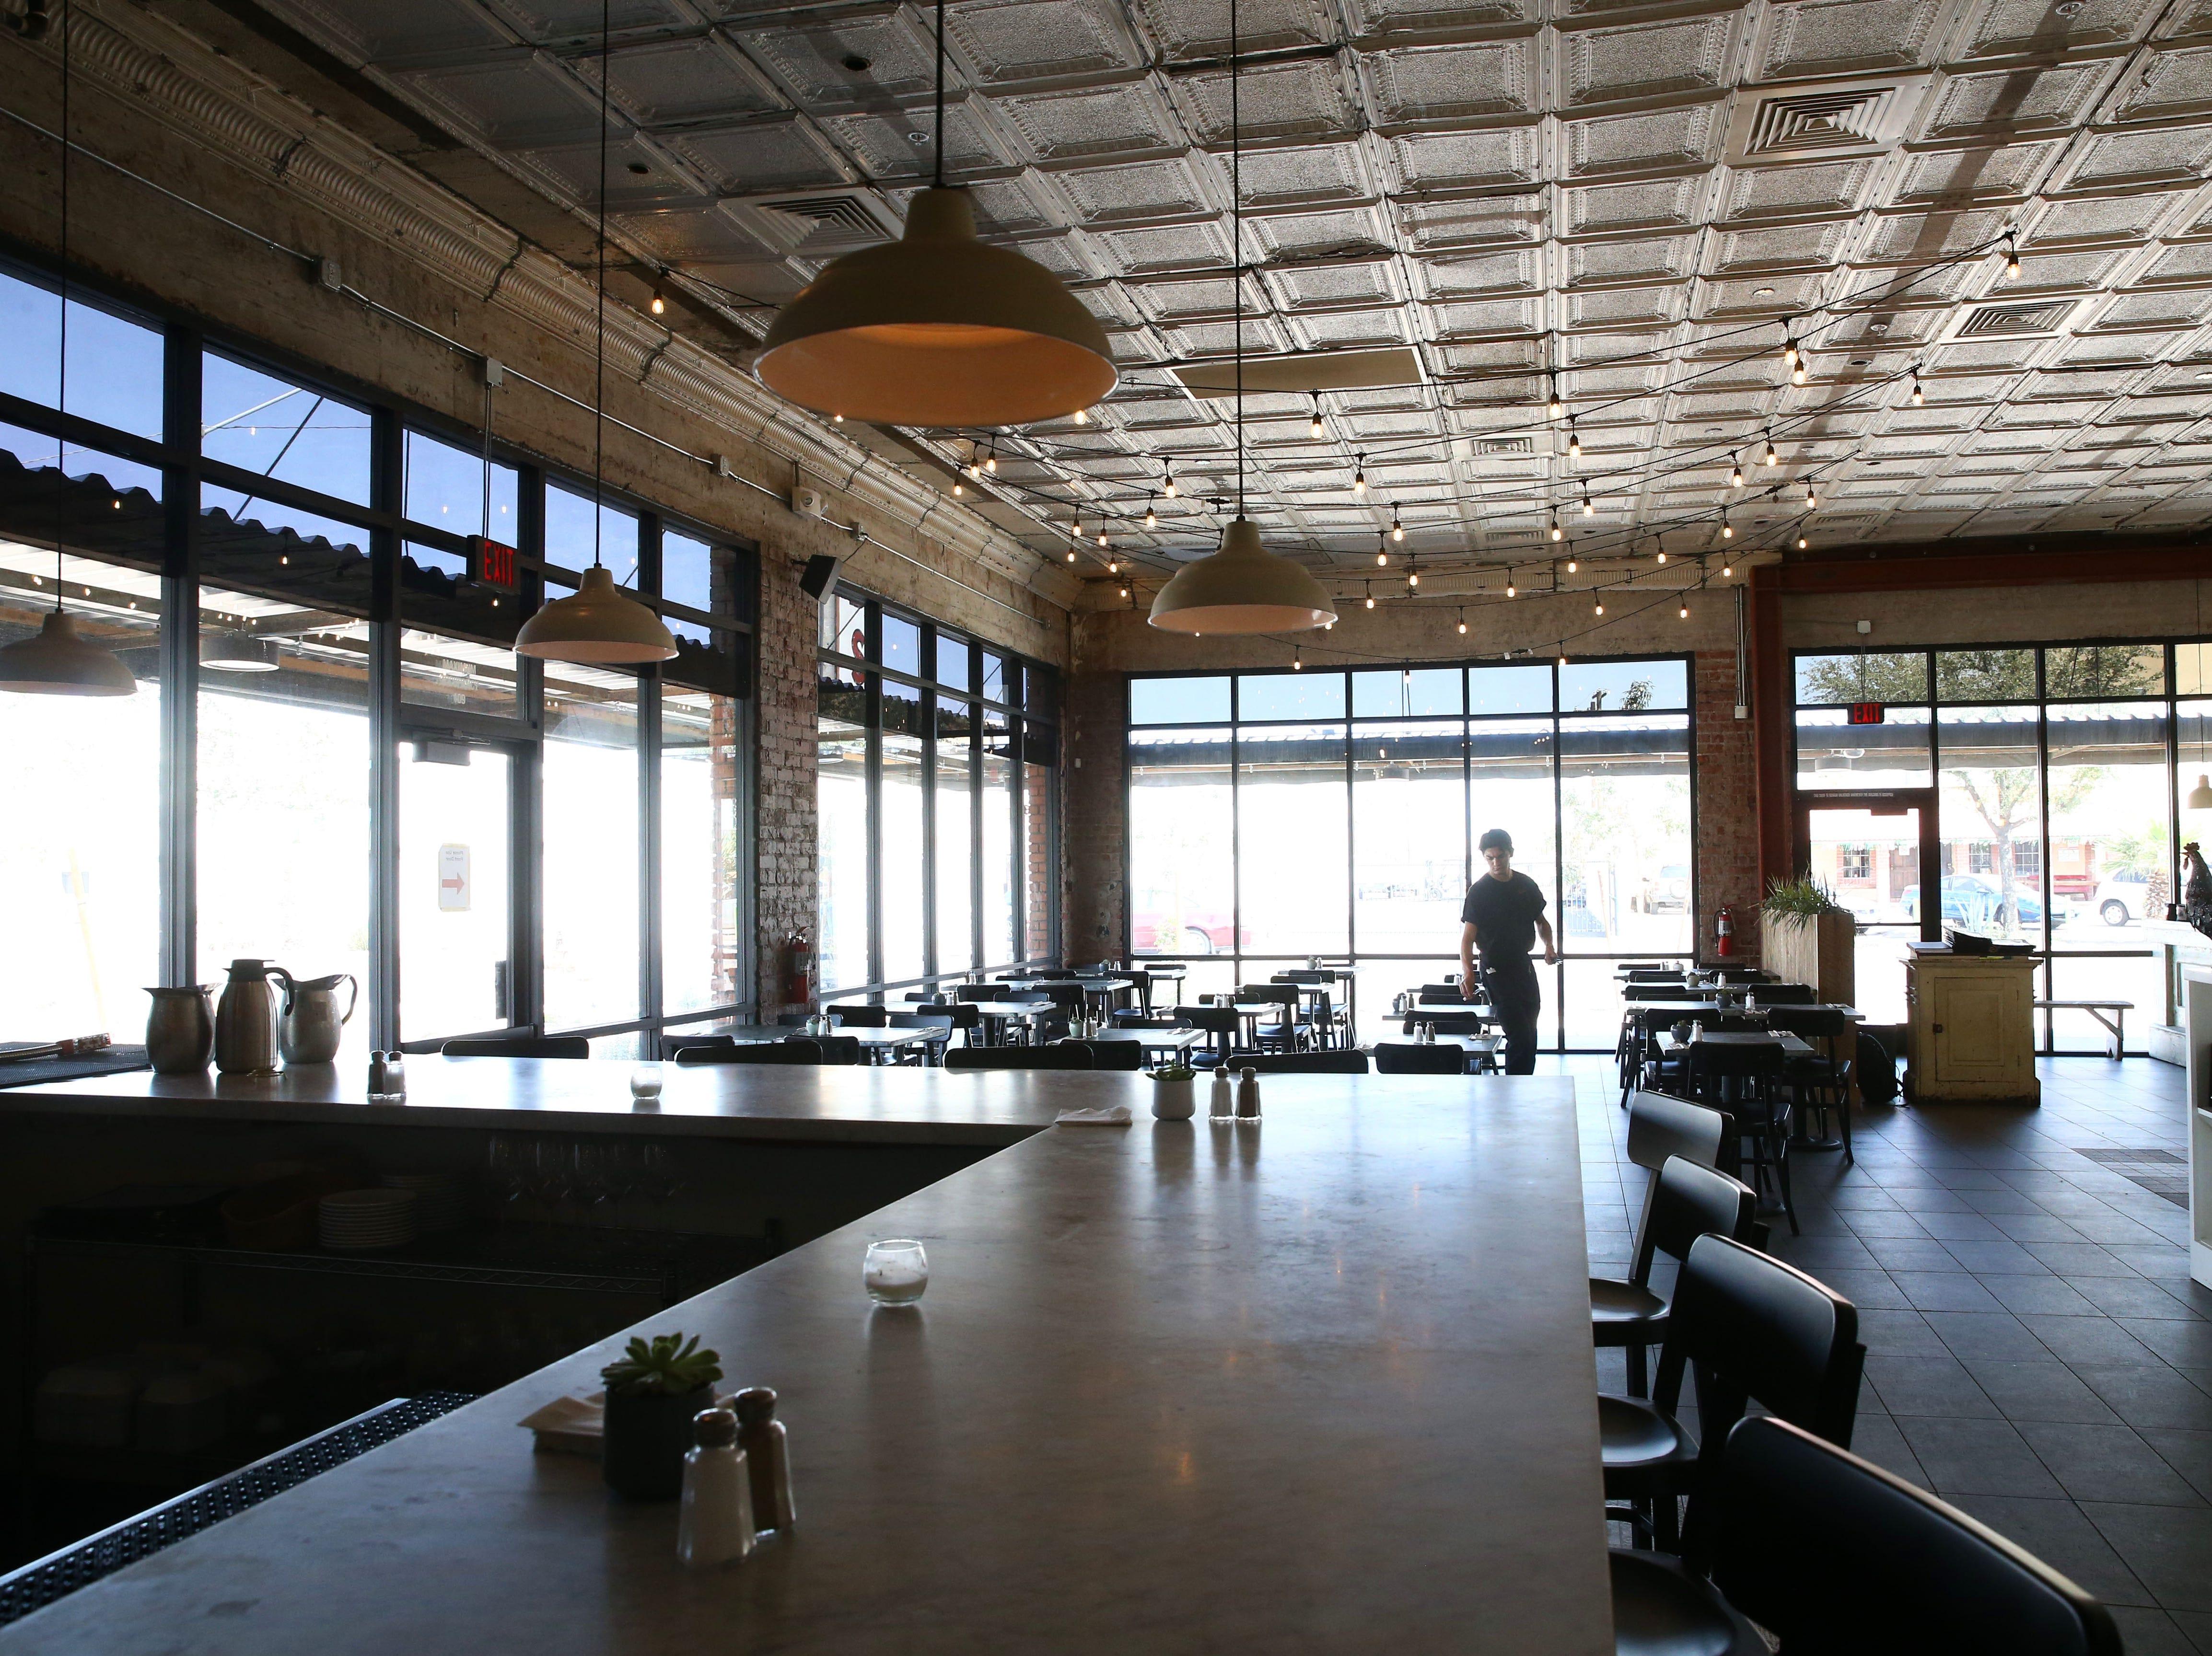 Roland's Cafe Market Bar on Aug. 20, 2018, in Phoenix, Ariz.